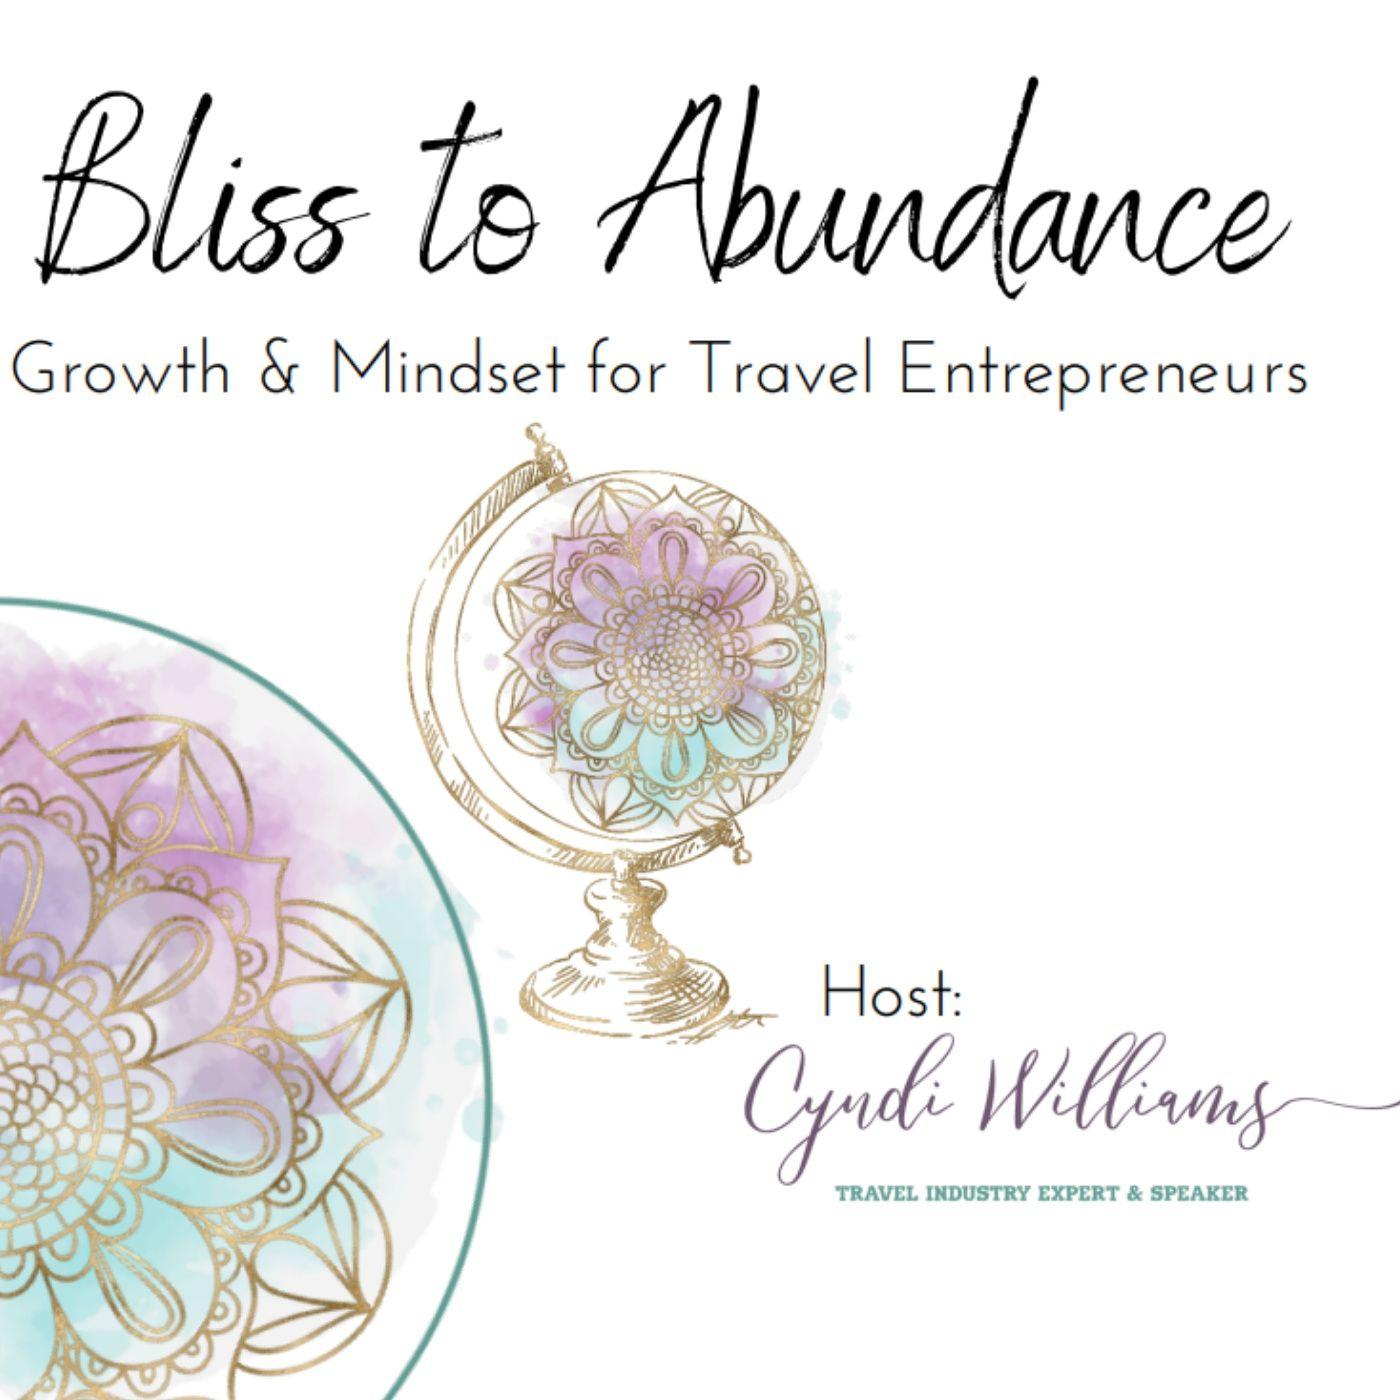 Bliss To Abundance